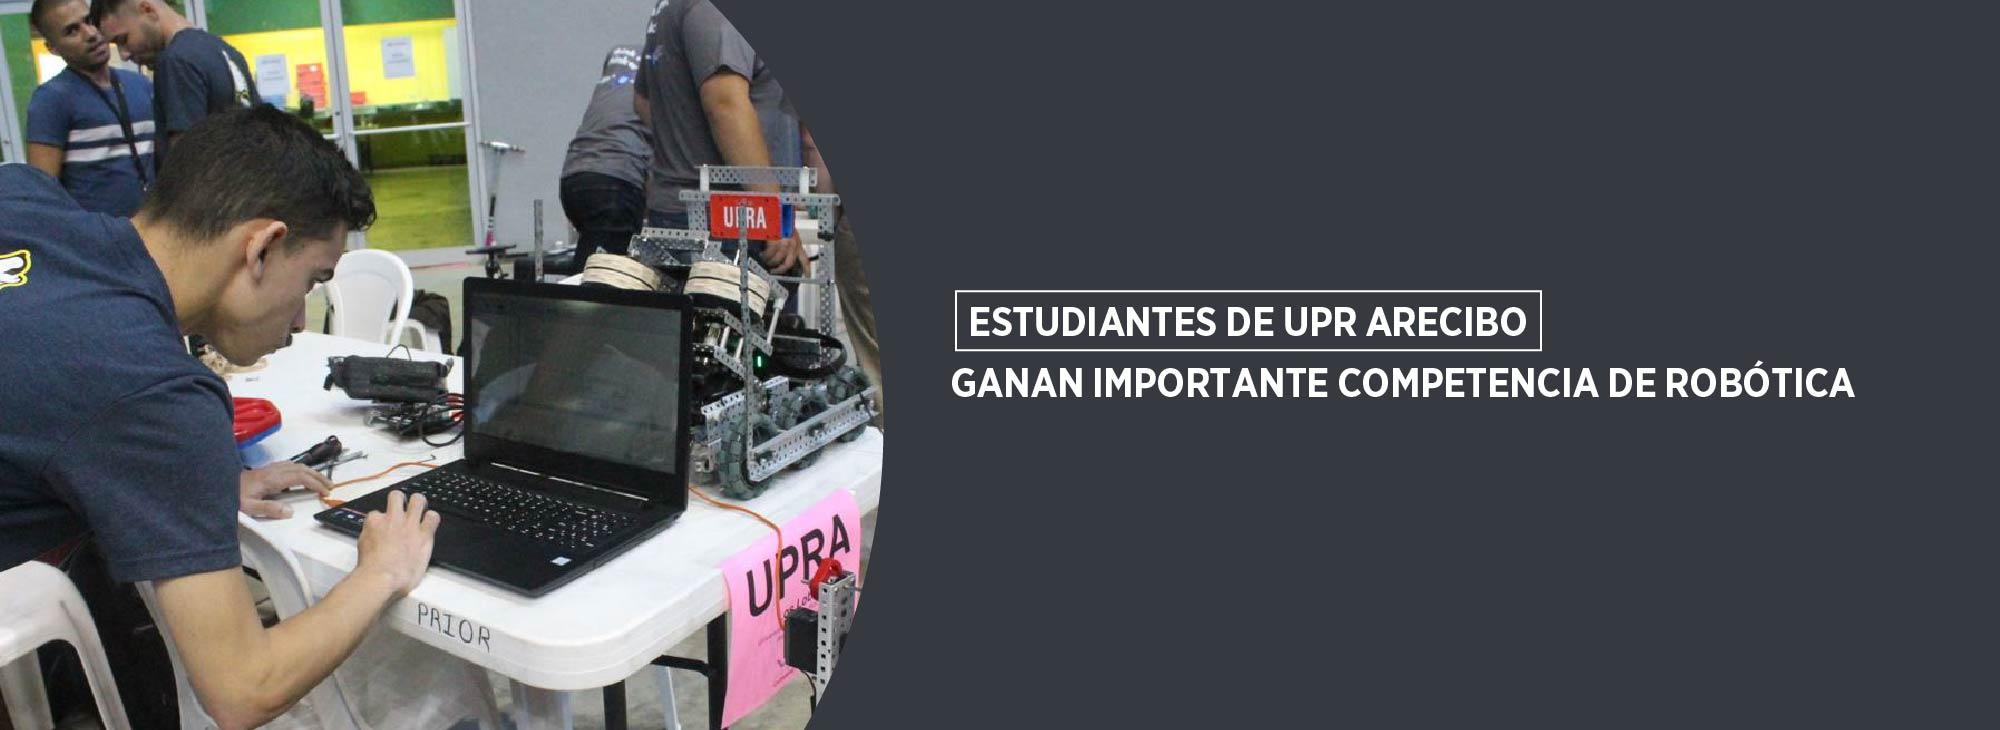 Robotica UPR Arecibo